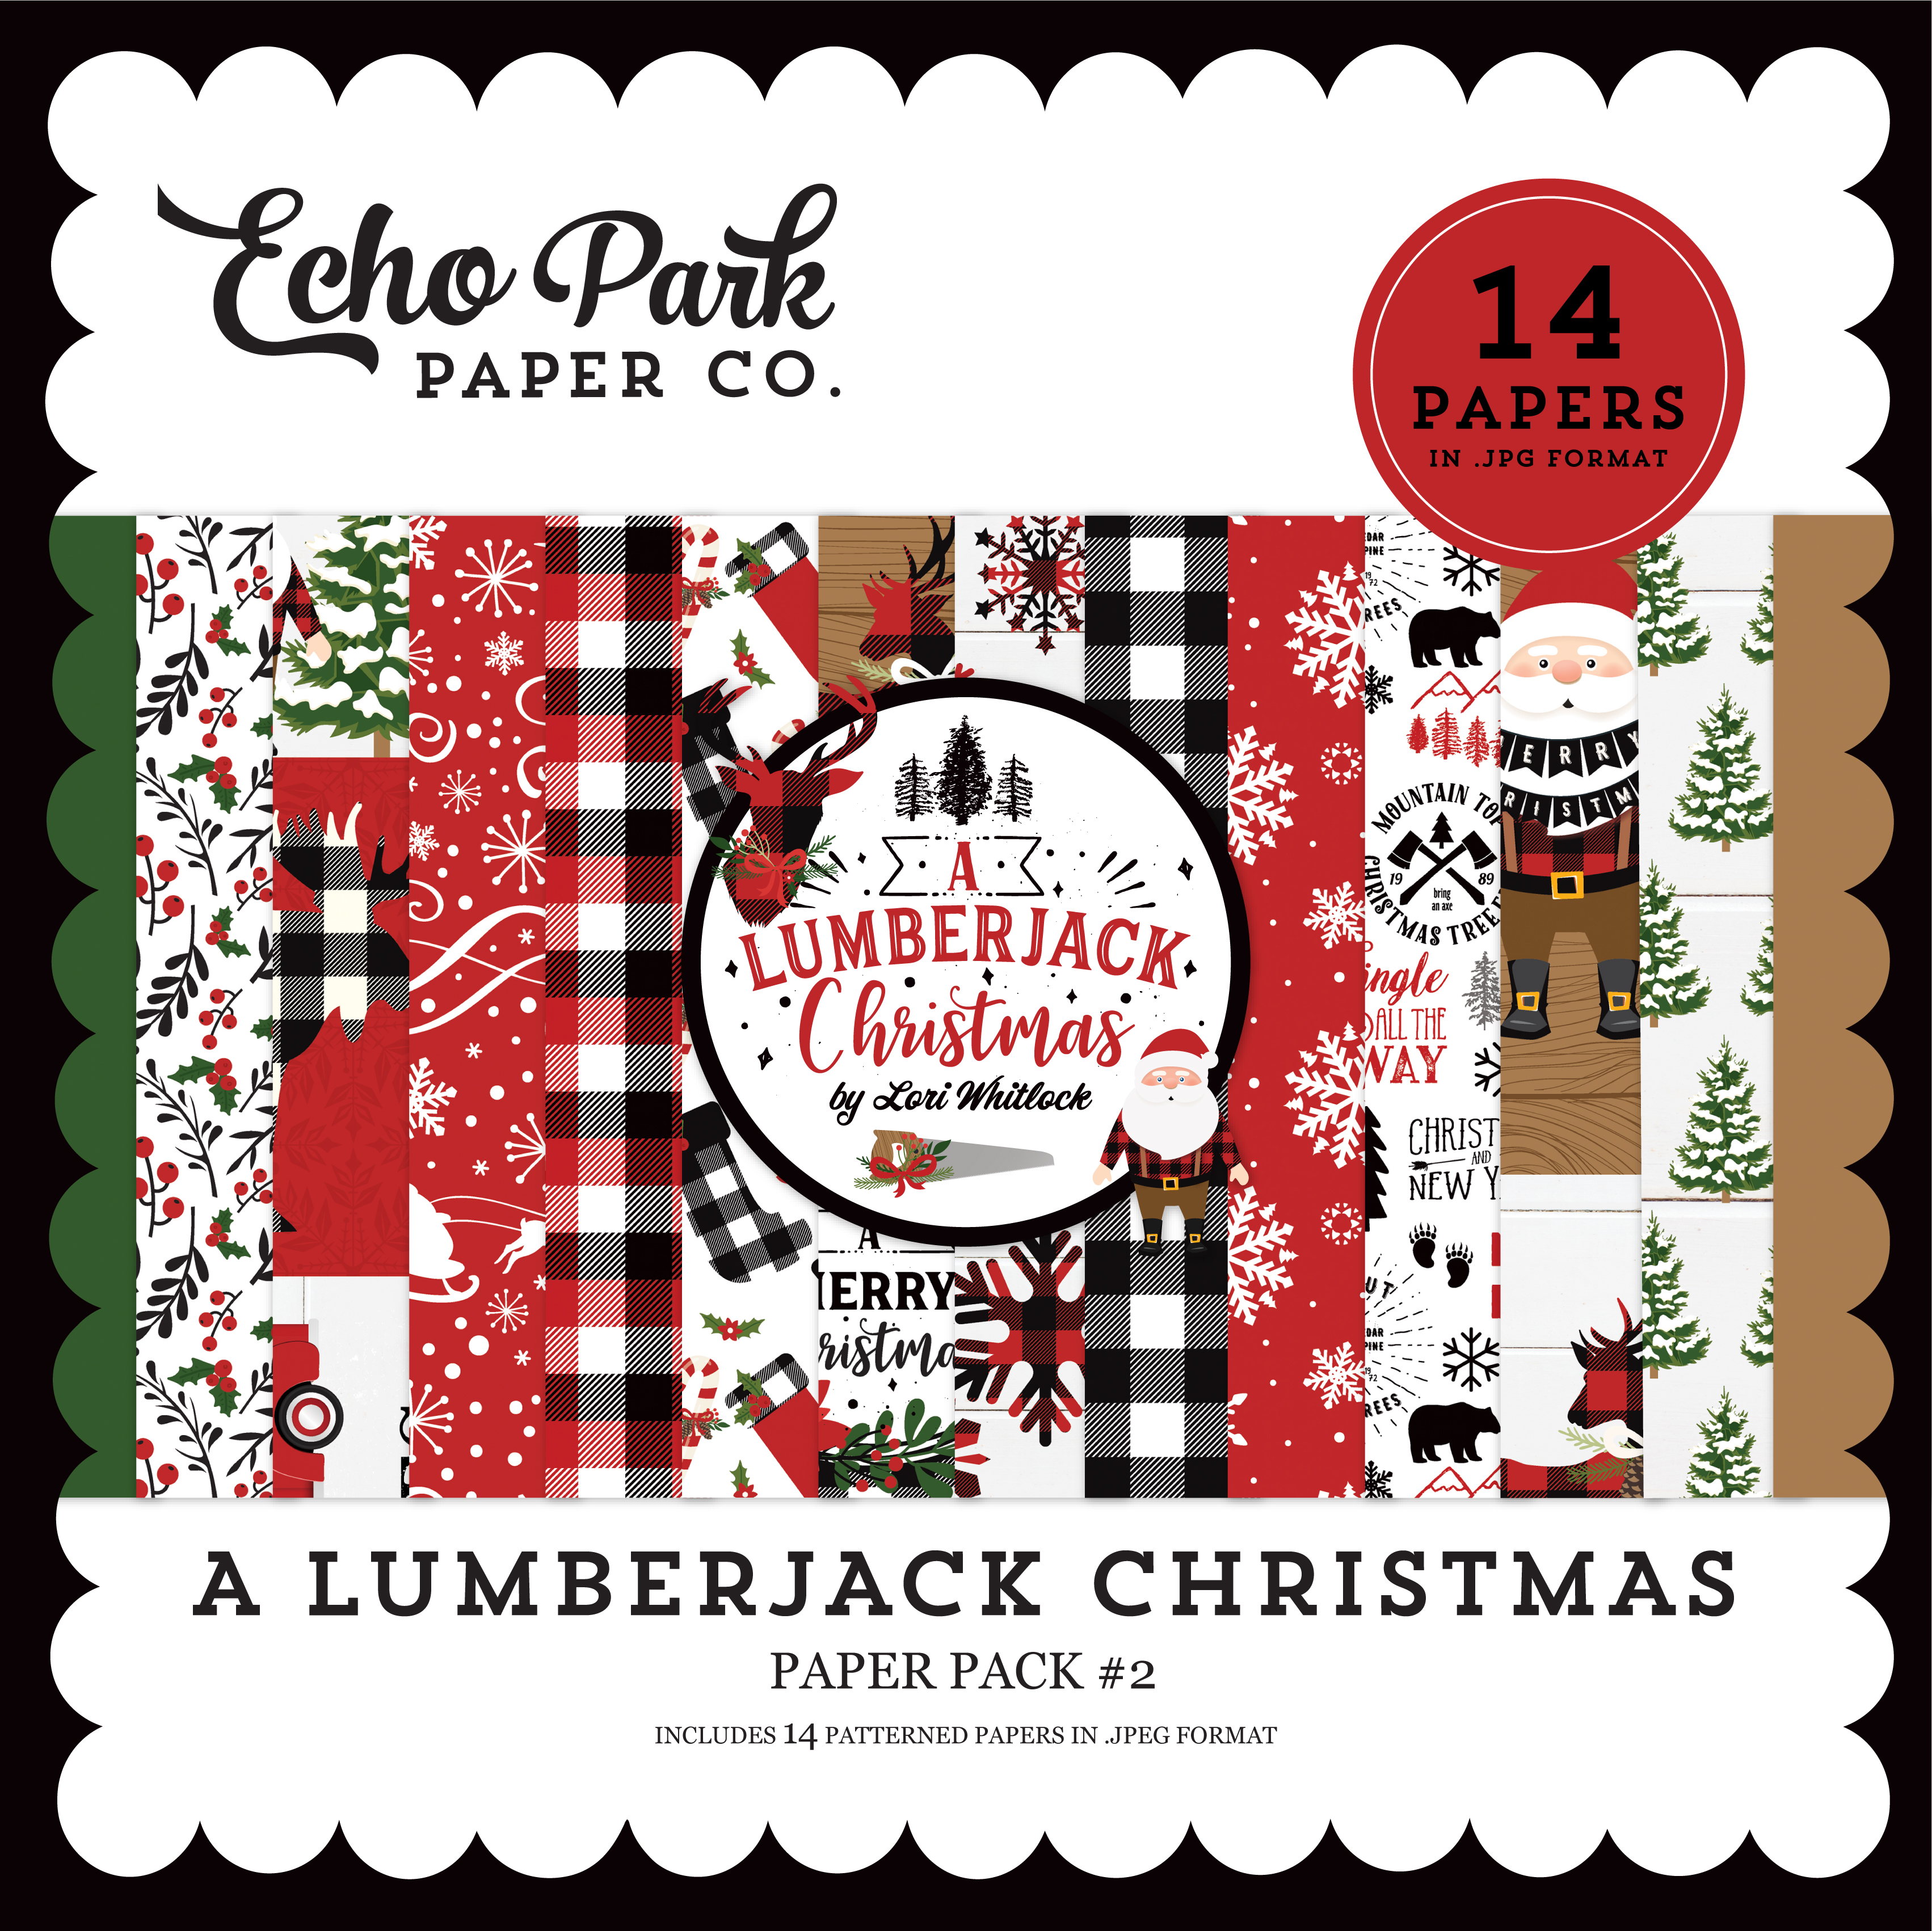 A Lumberjack Christmas Paper Pack #2